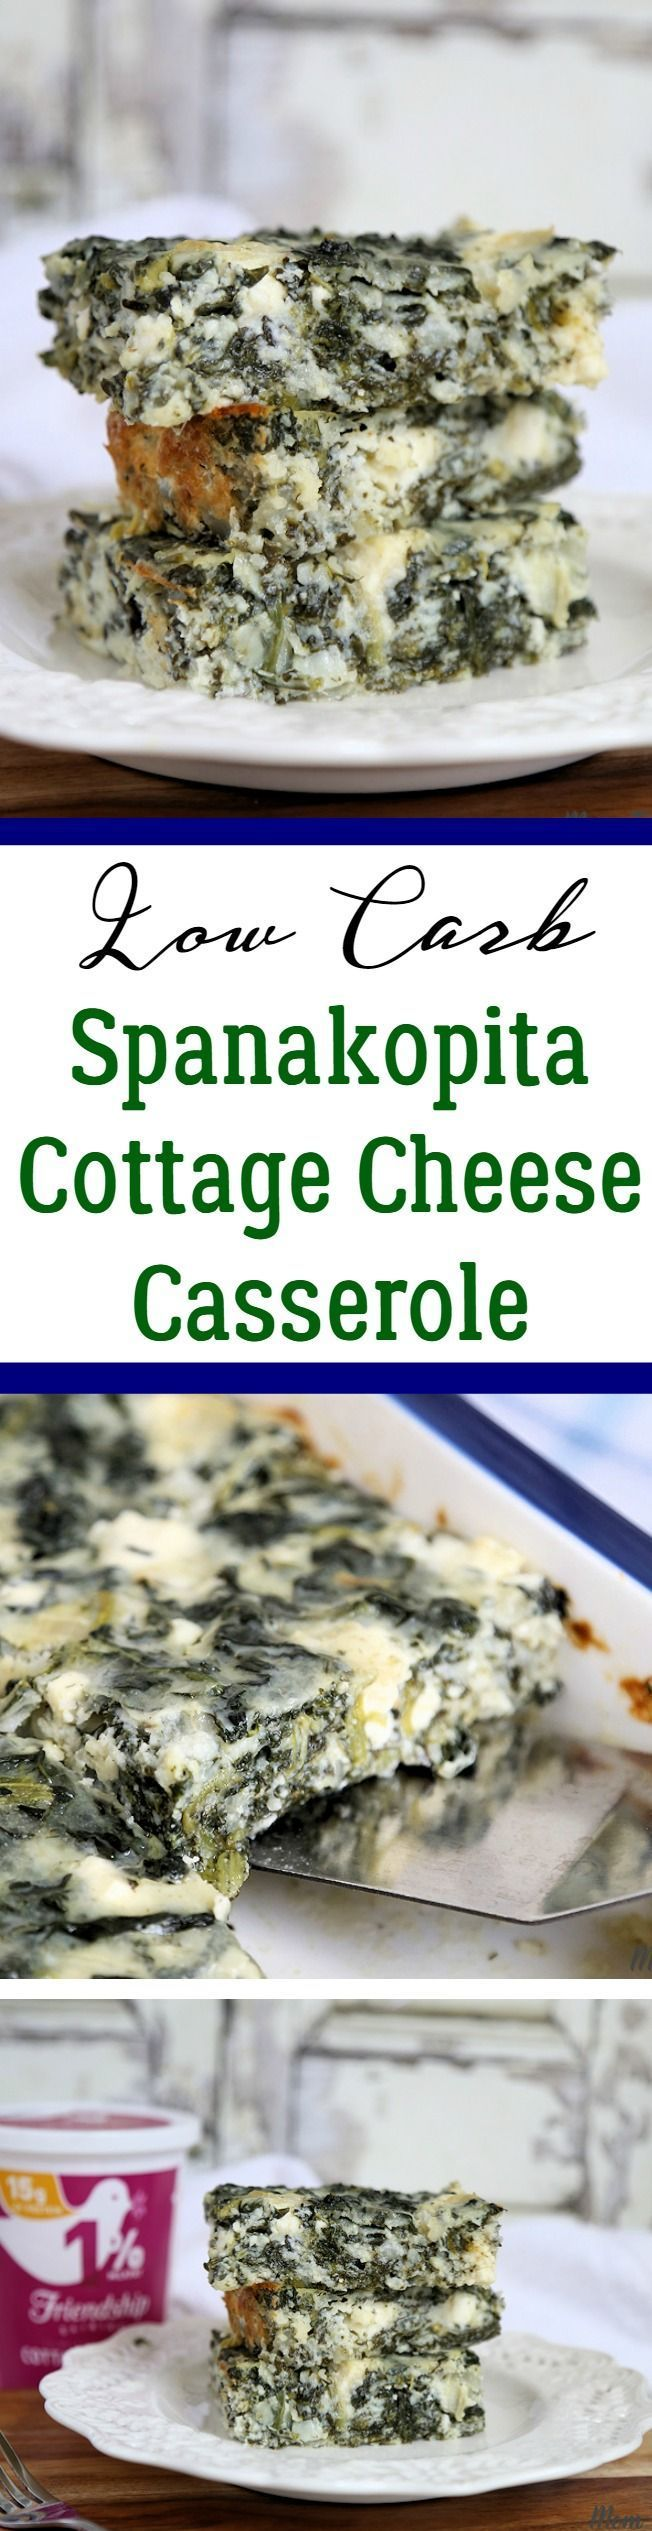 Low Carb Spanakopita Cottage Cheese Casserole recipe